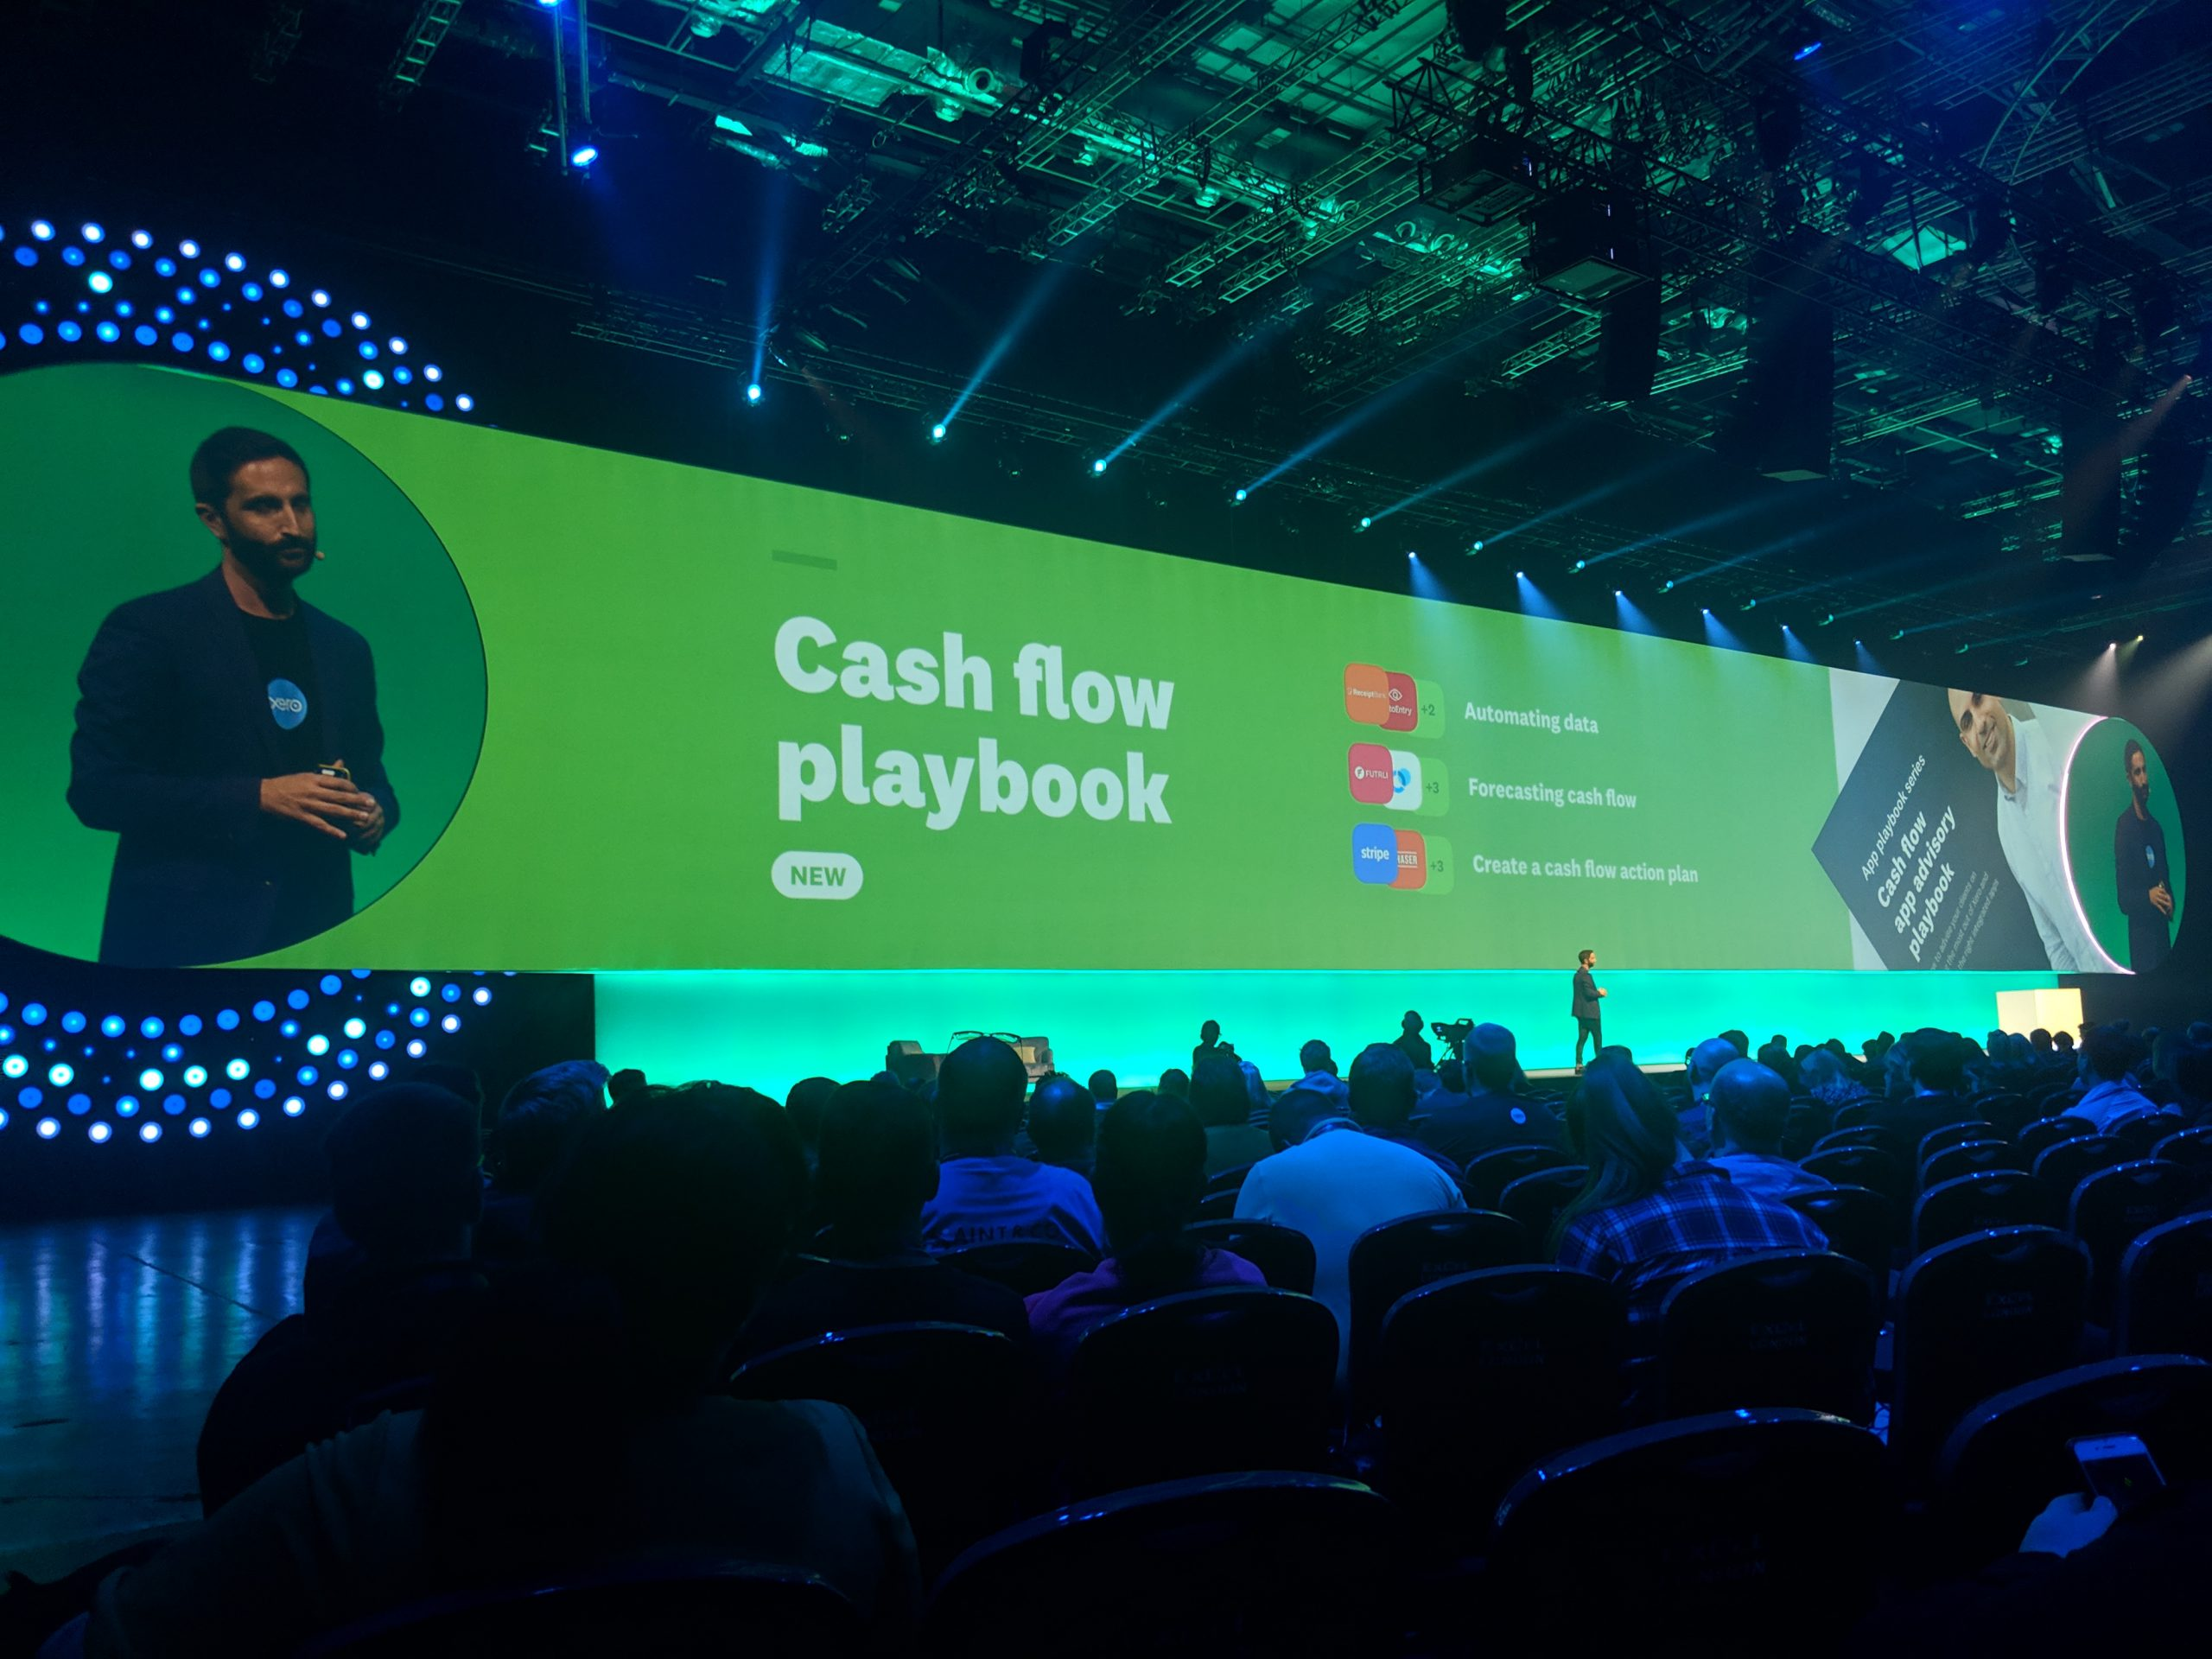 xero-cashflow-playbook